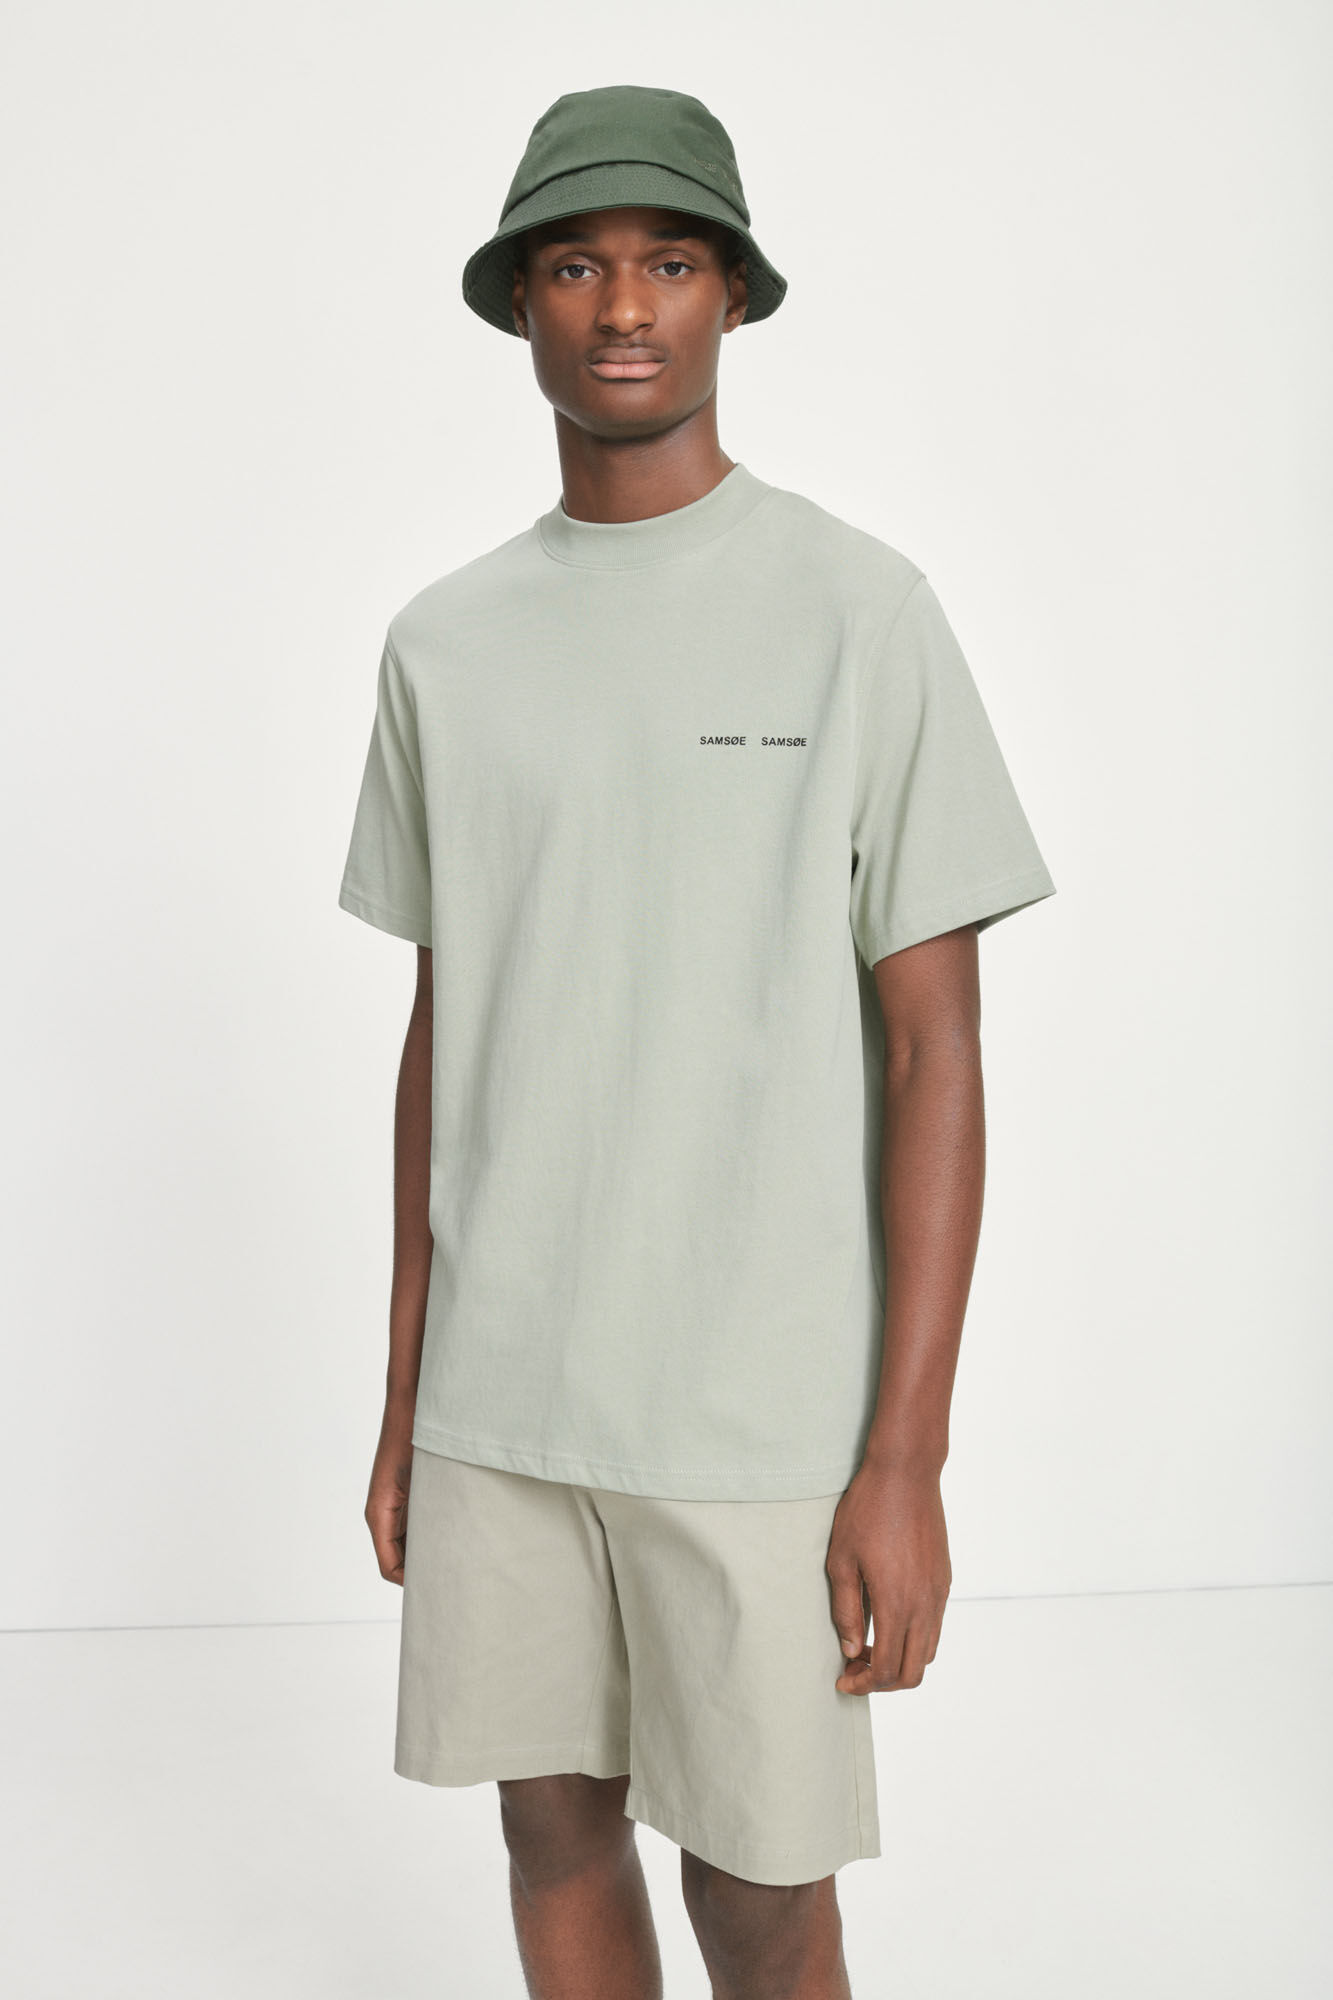 Samsøe & Samsøe Norsbro S/S t-shirt, seagrass, large